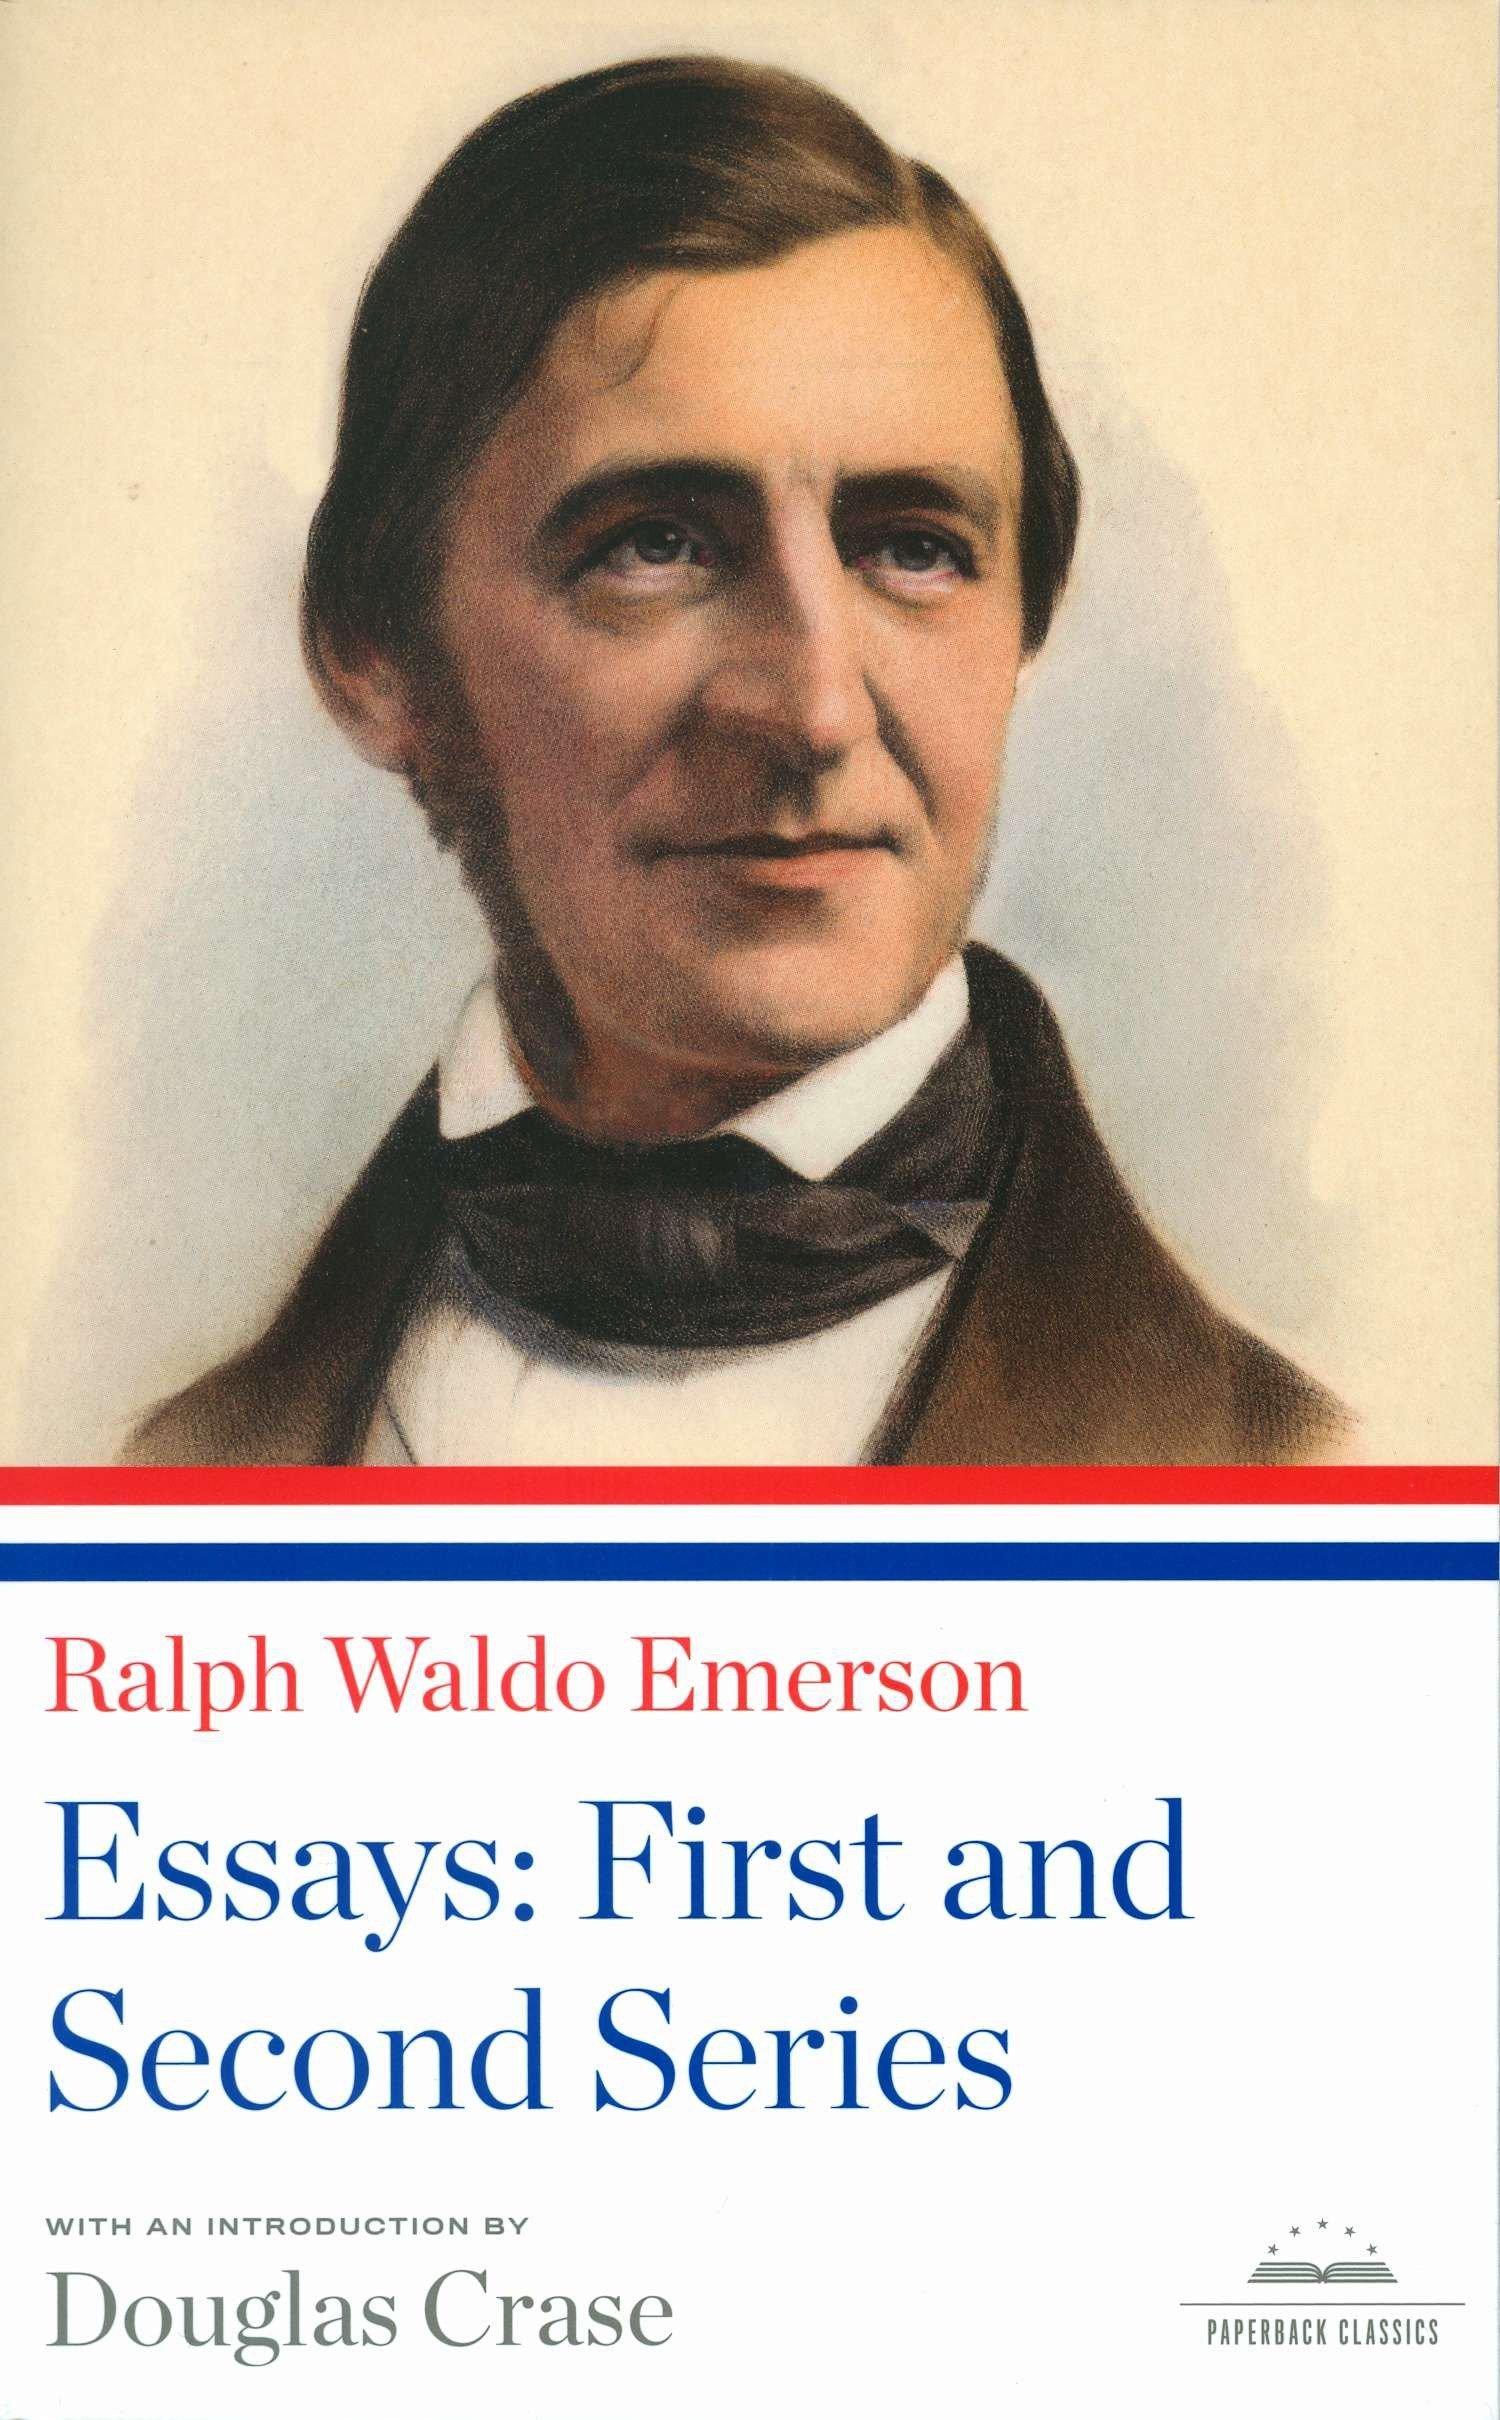 005 81bbtjzup6l Essay Example Emerson Dreaded Essays Ralph Pdf First Series Summary Waldo Nature Full